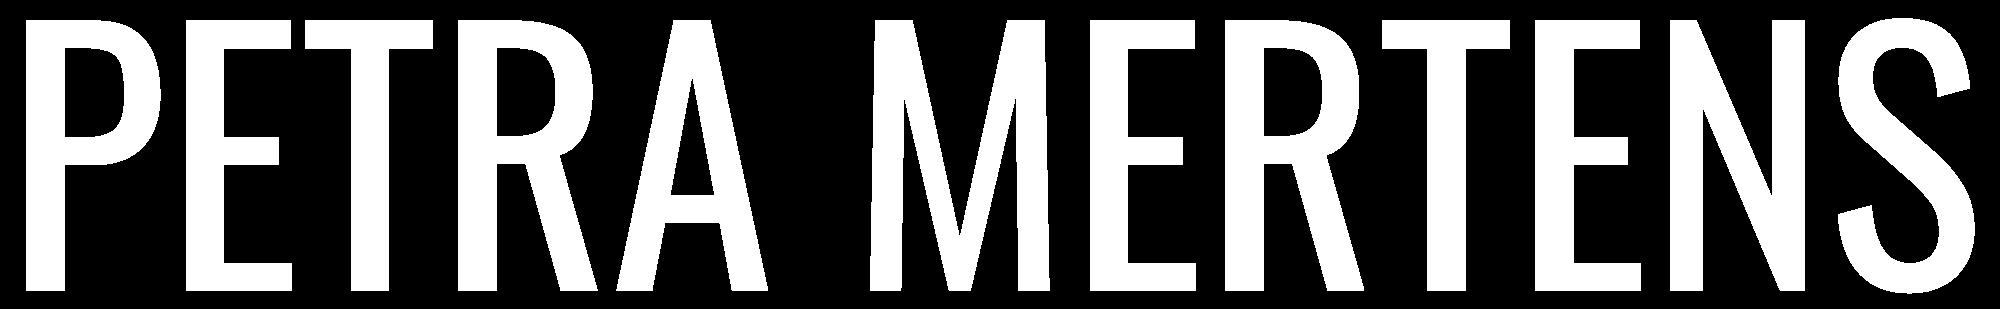 logo petra mertens